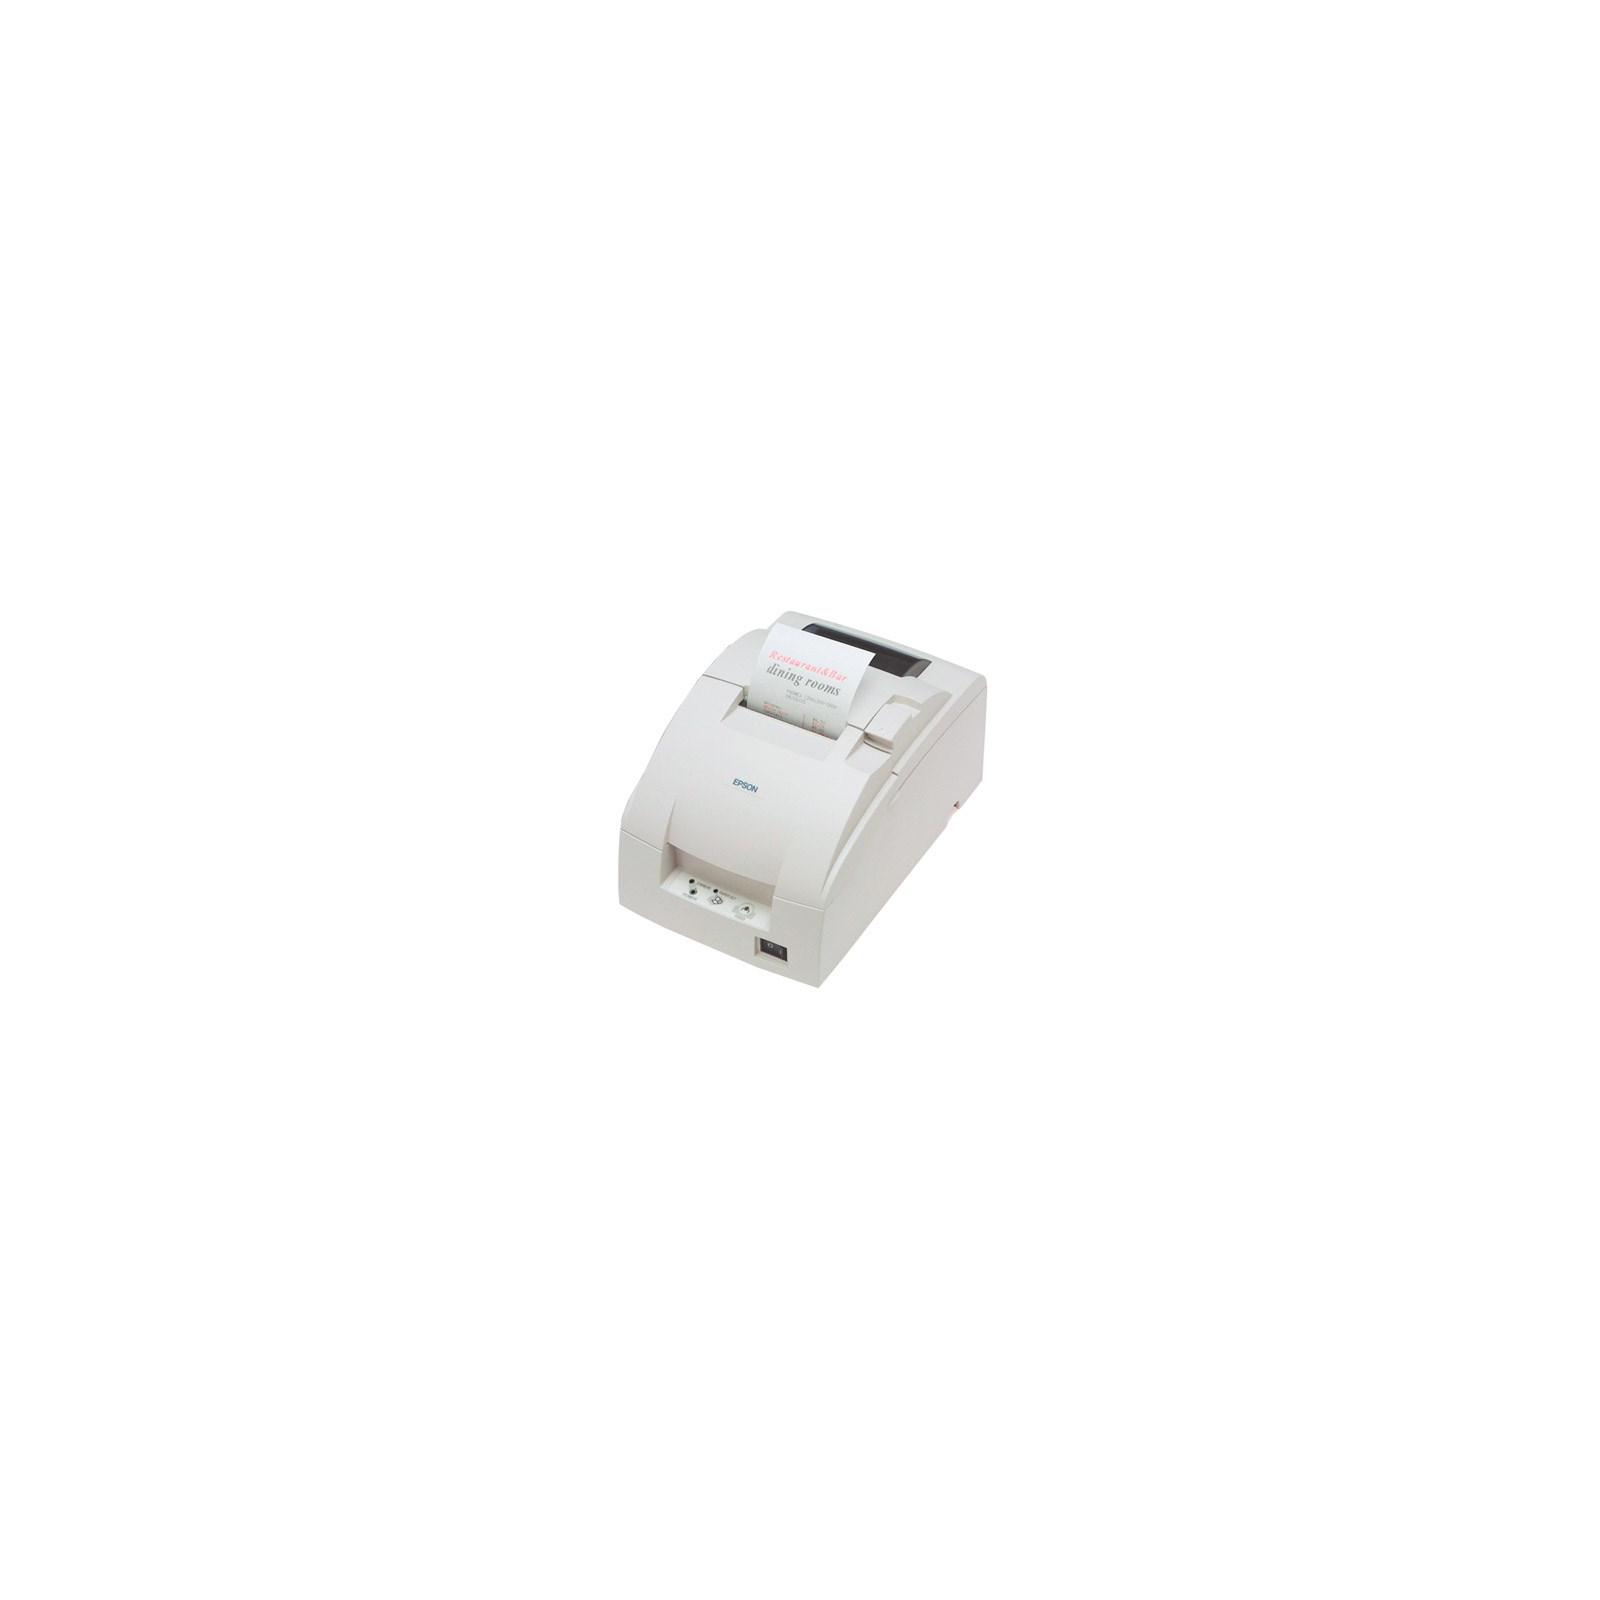 Принтер чеков TM-U220PA-057(067) LPT I/F EPSON (C31C516057)